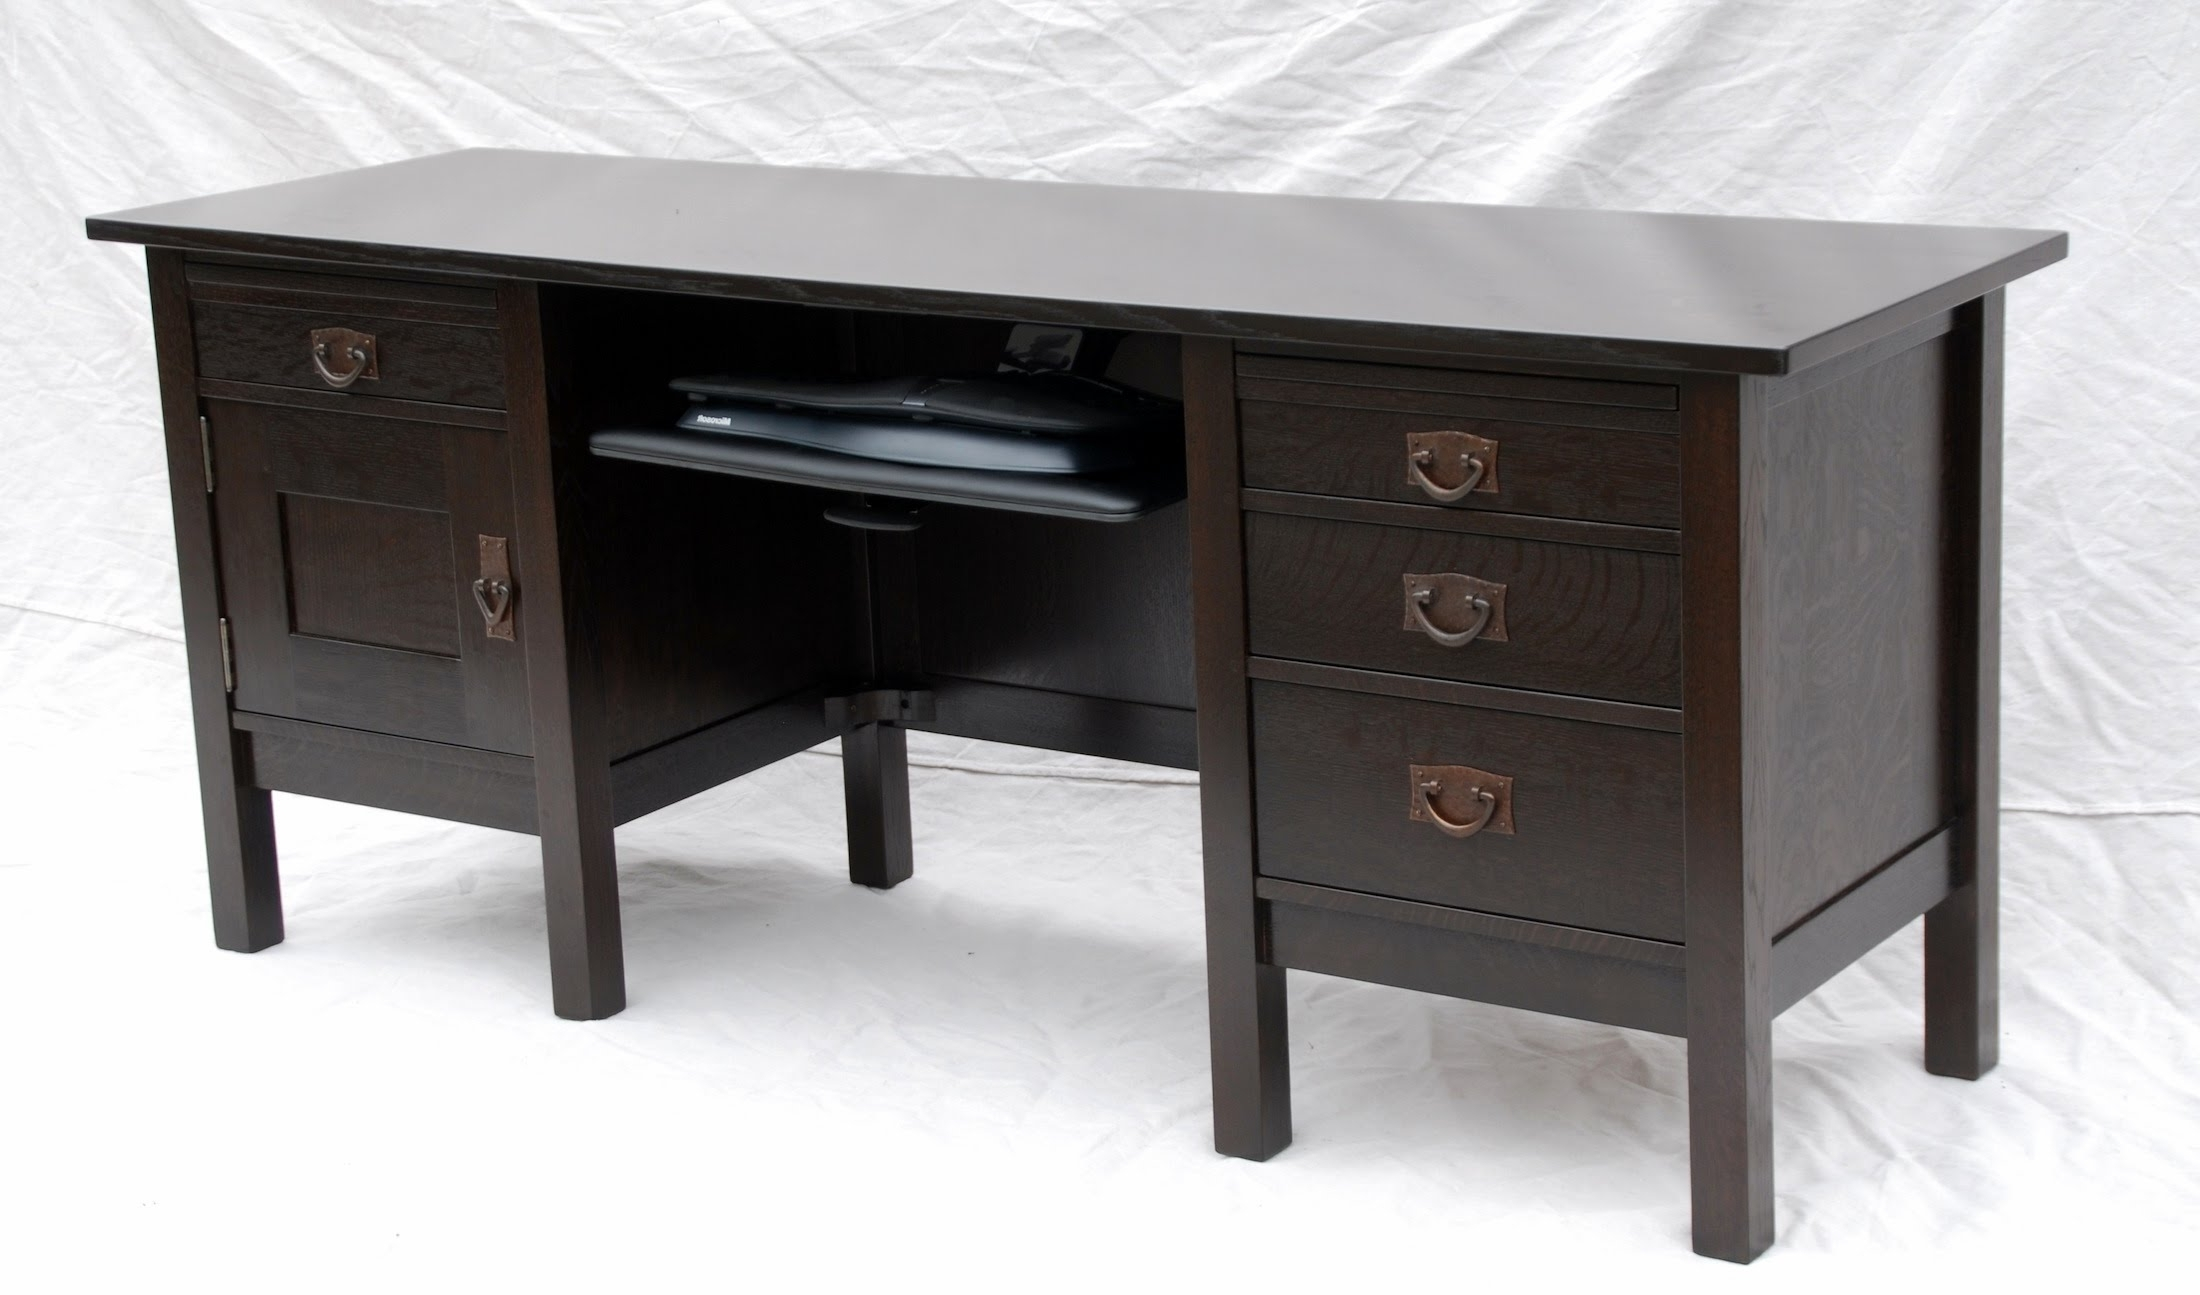 Widely Used Voorhees Craftsman Mission Oak Furniture – Voorhees Craftsman In Executive Computer Desks (View 11 of 20)